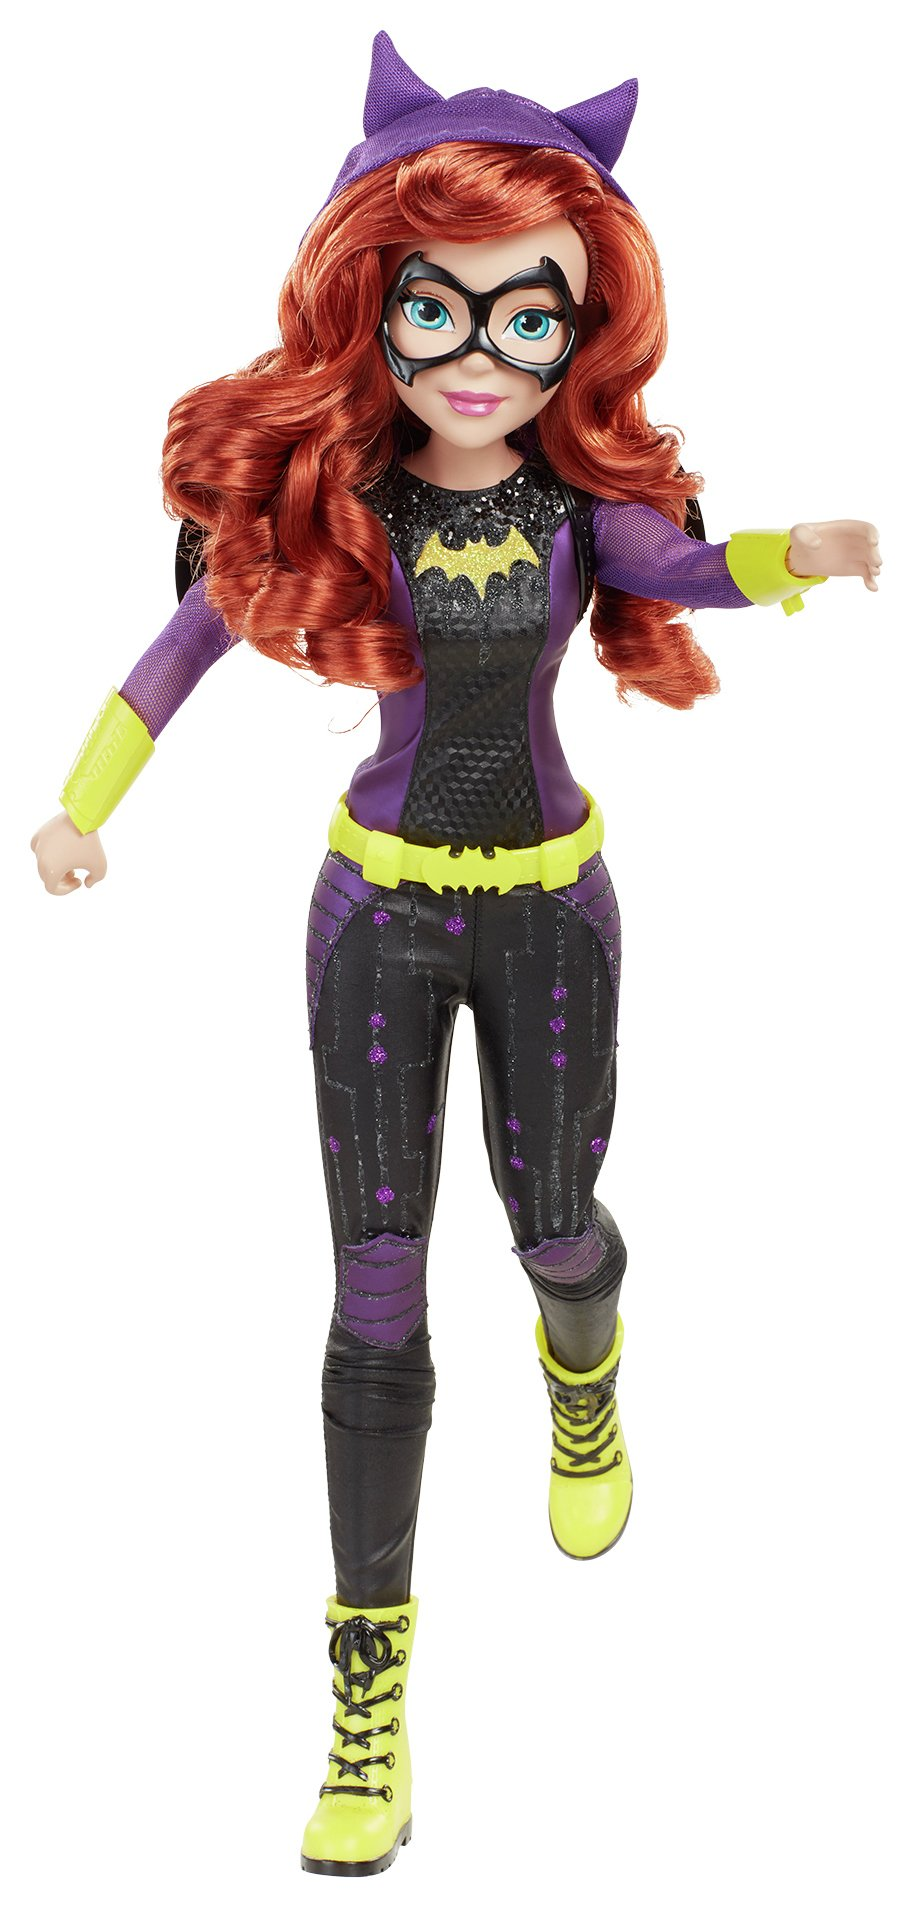 Image of DC Superhero Girls Action Figures Assortment